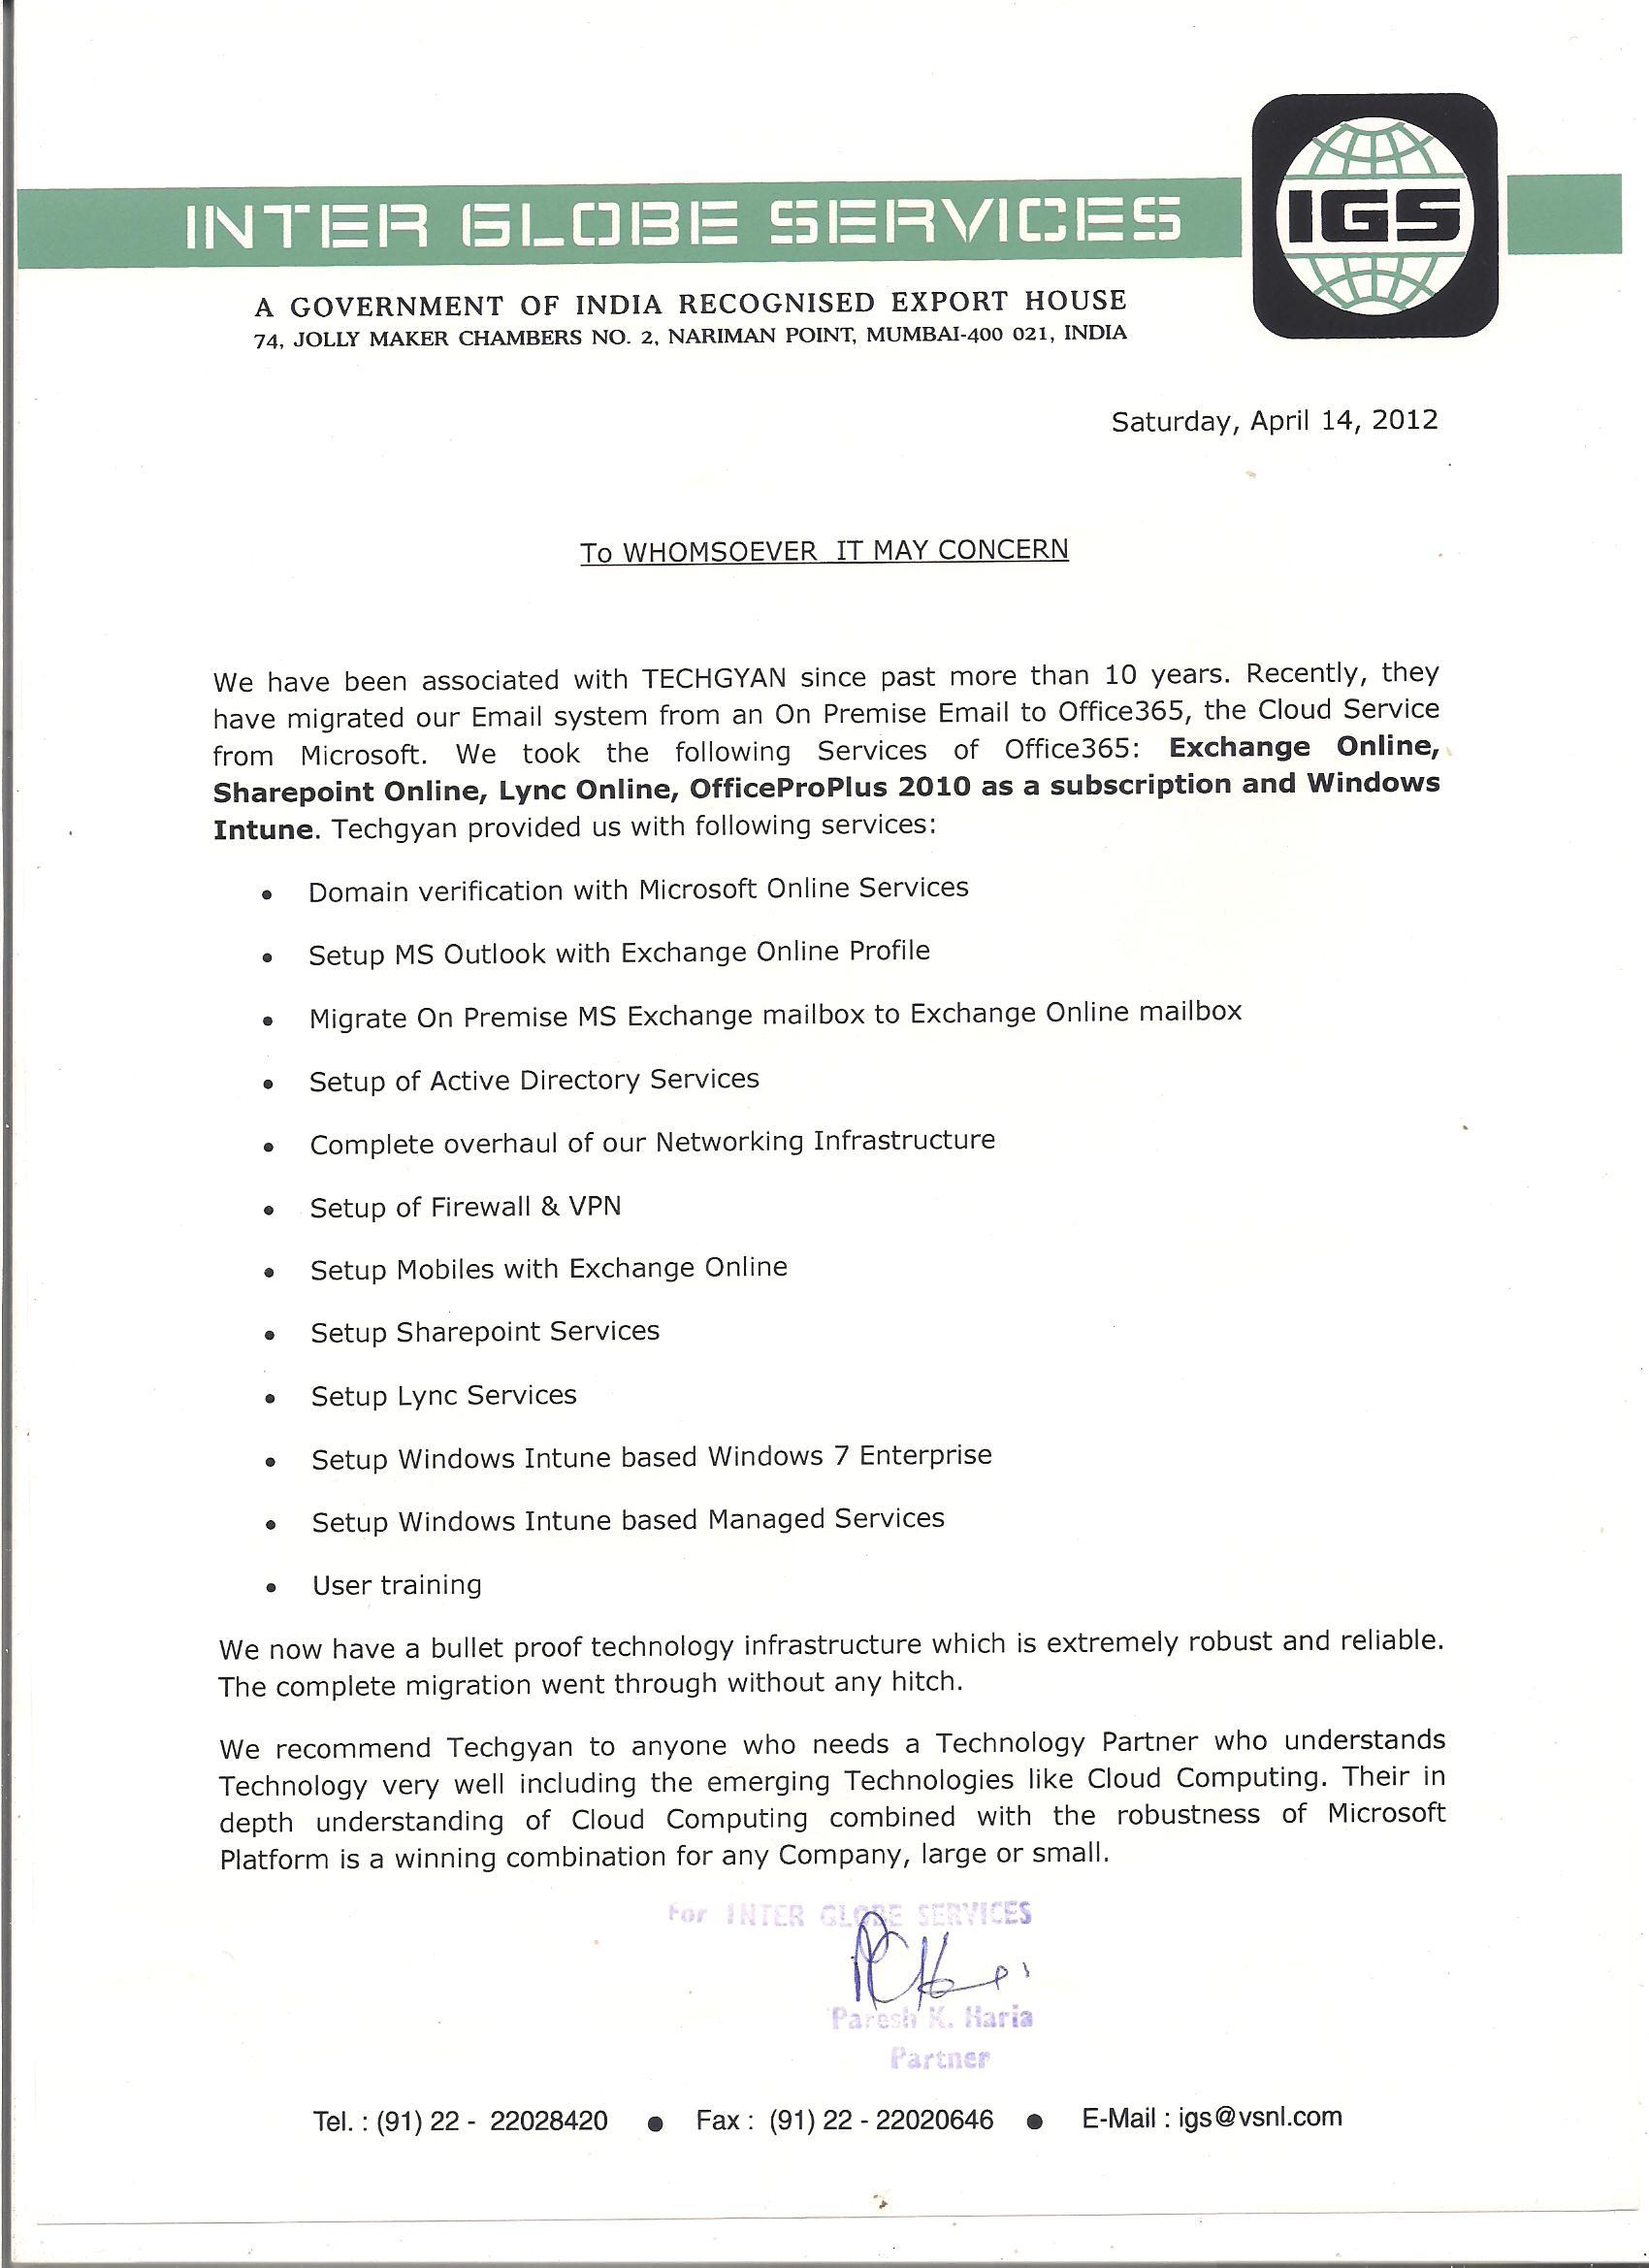 Inter Globe Service Letter